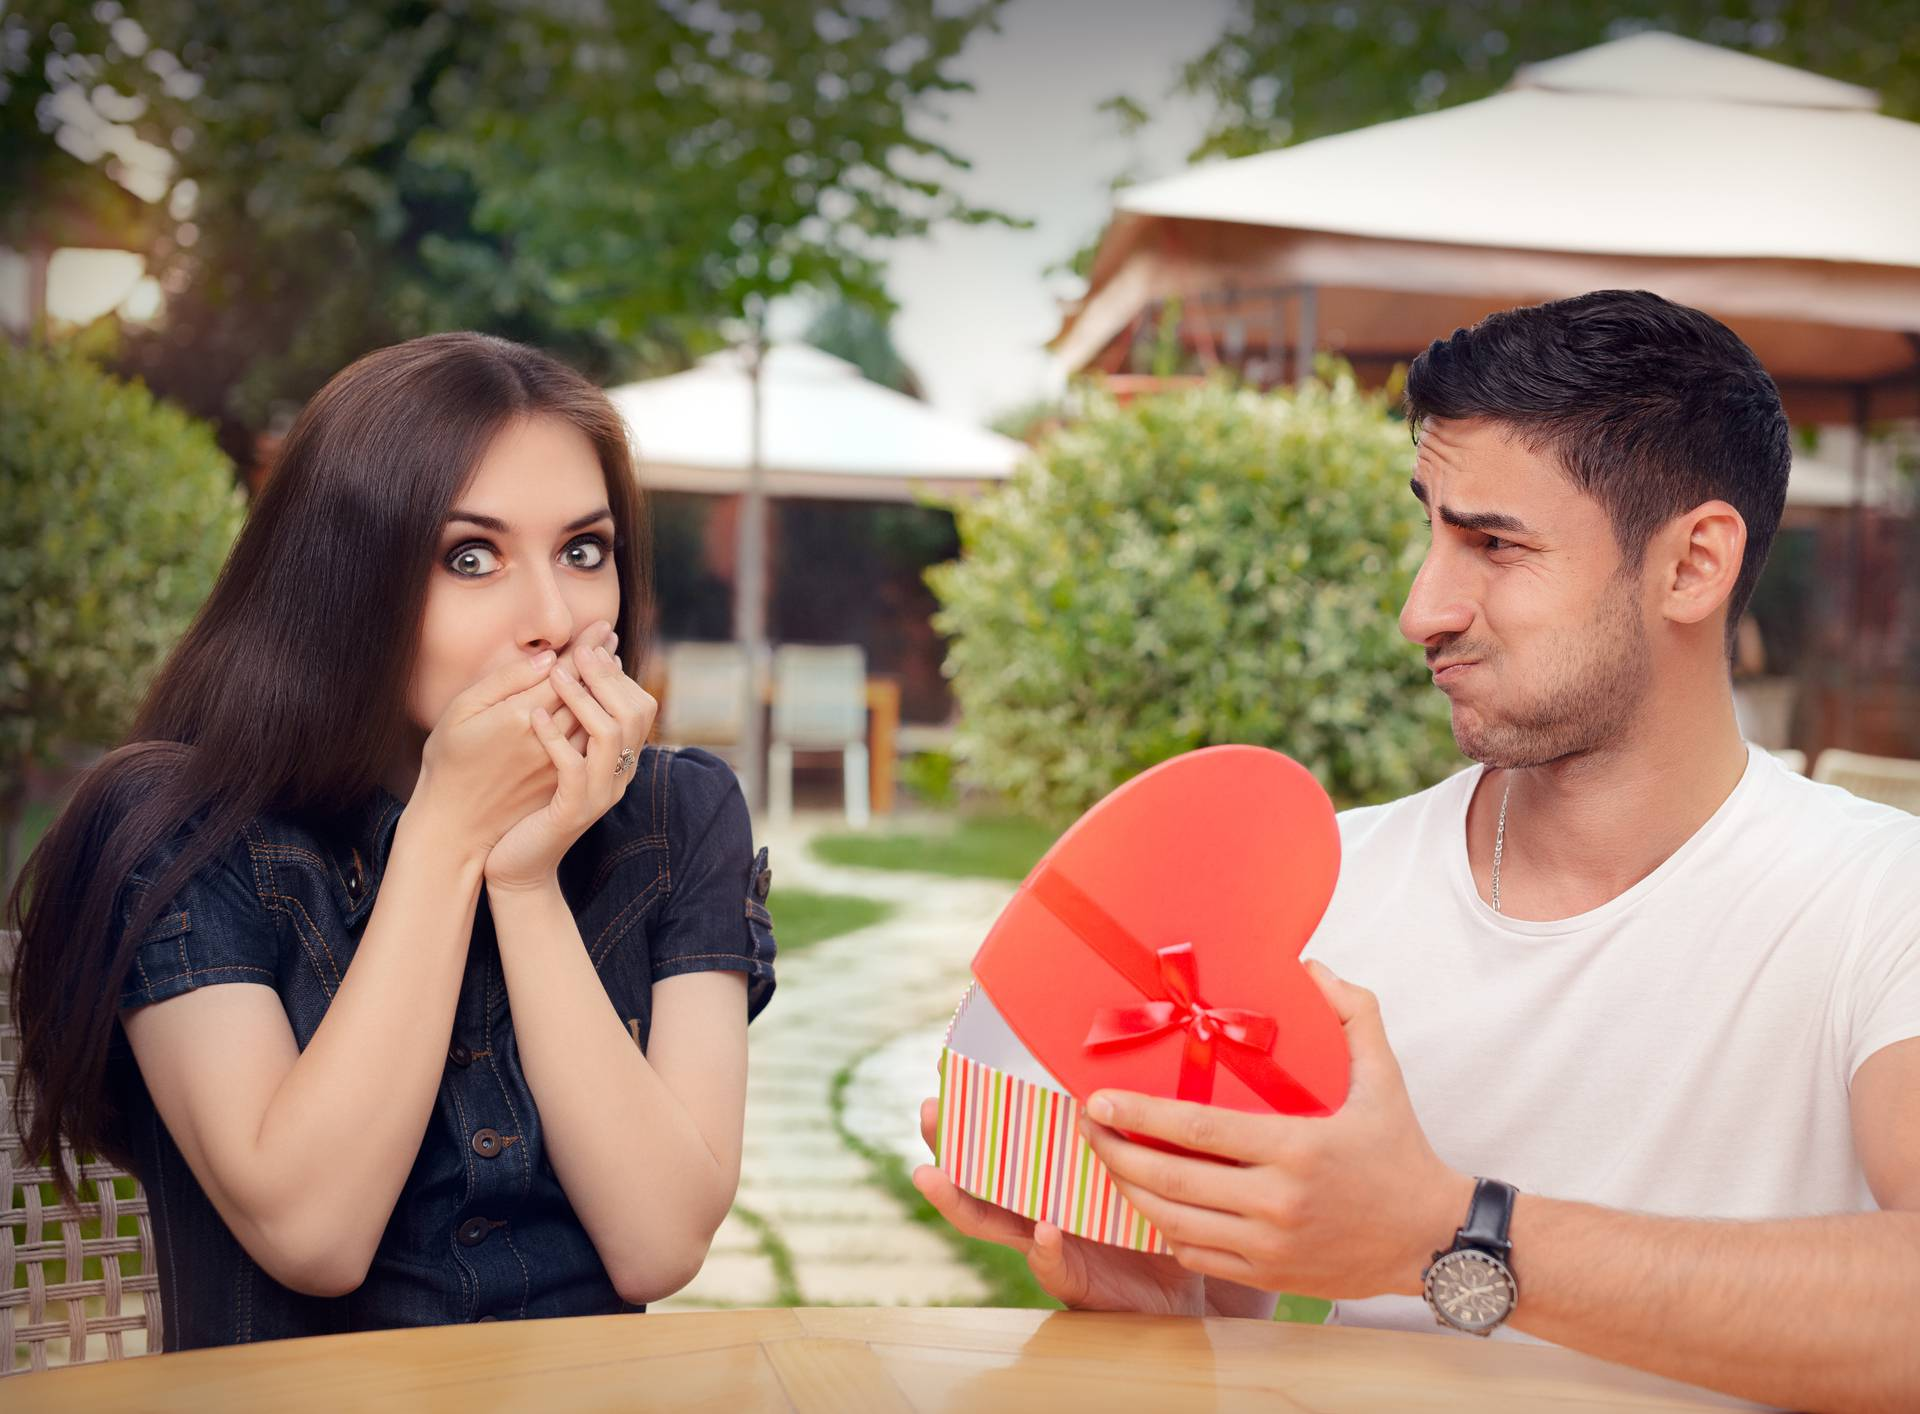 Happy Girl Receiving Heart Shaped Gift from her Boyfriend